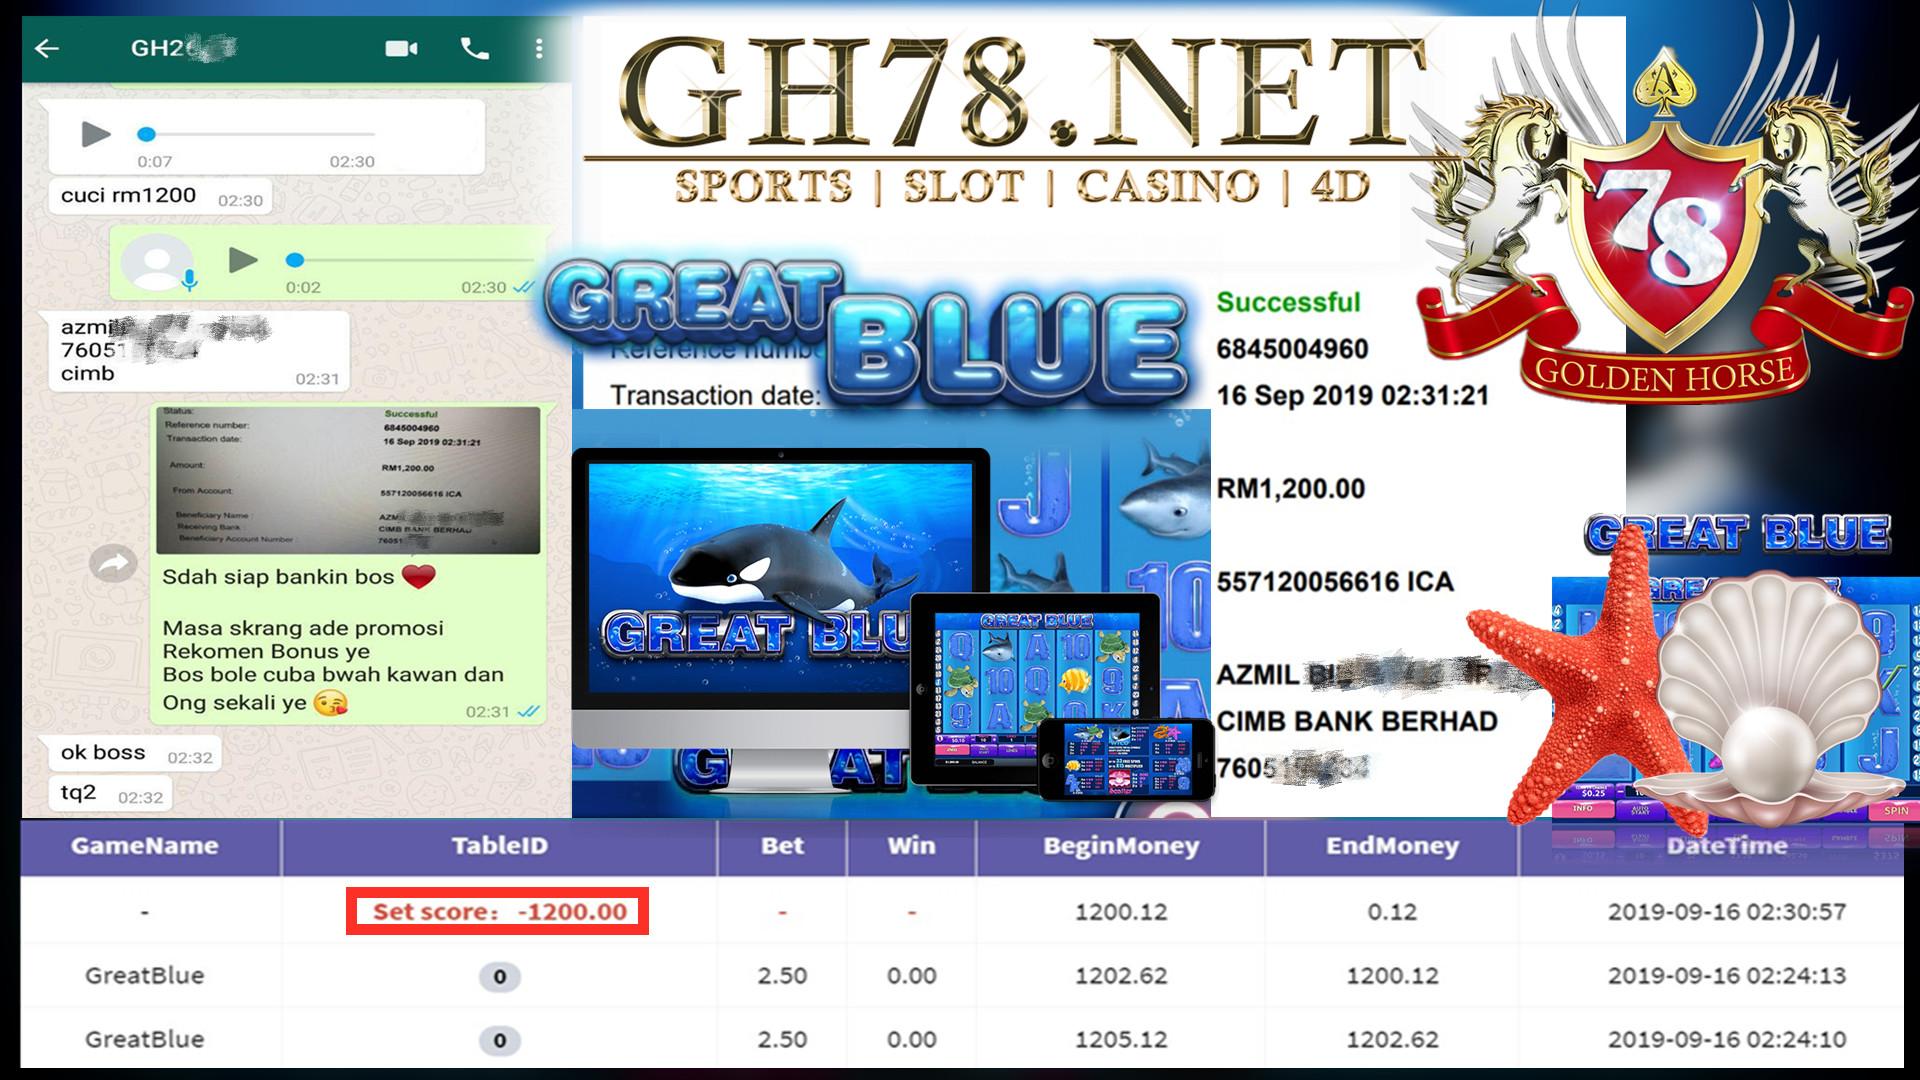 MEMBER MAIN GAME GREATBLUE MINTA CUCI RM1200 !!!